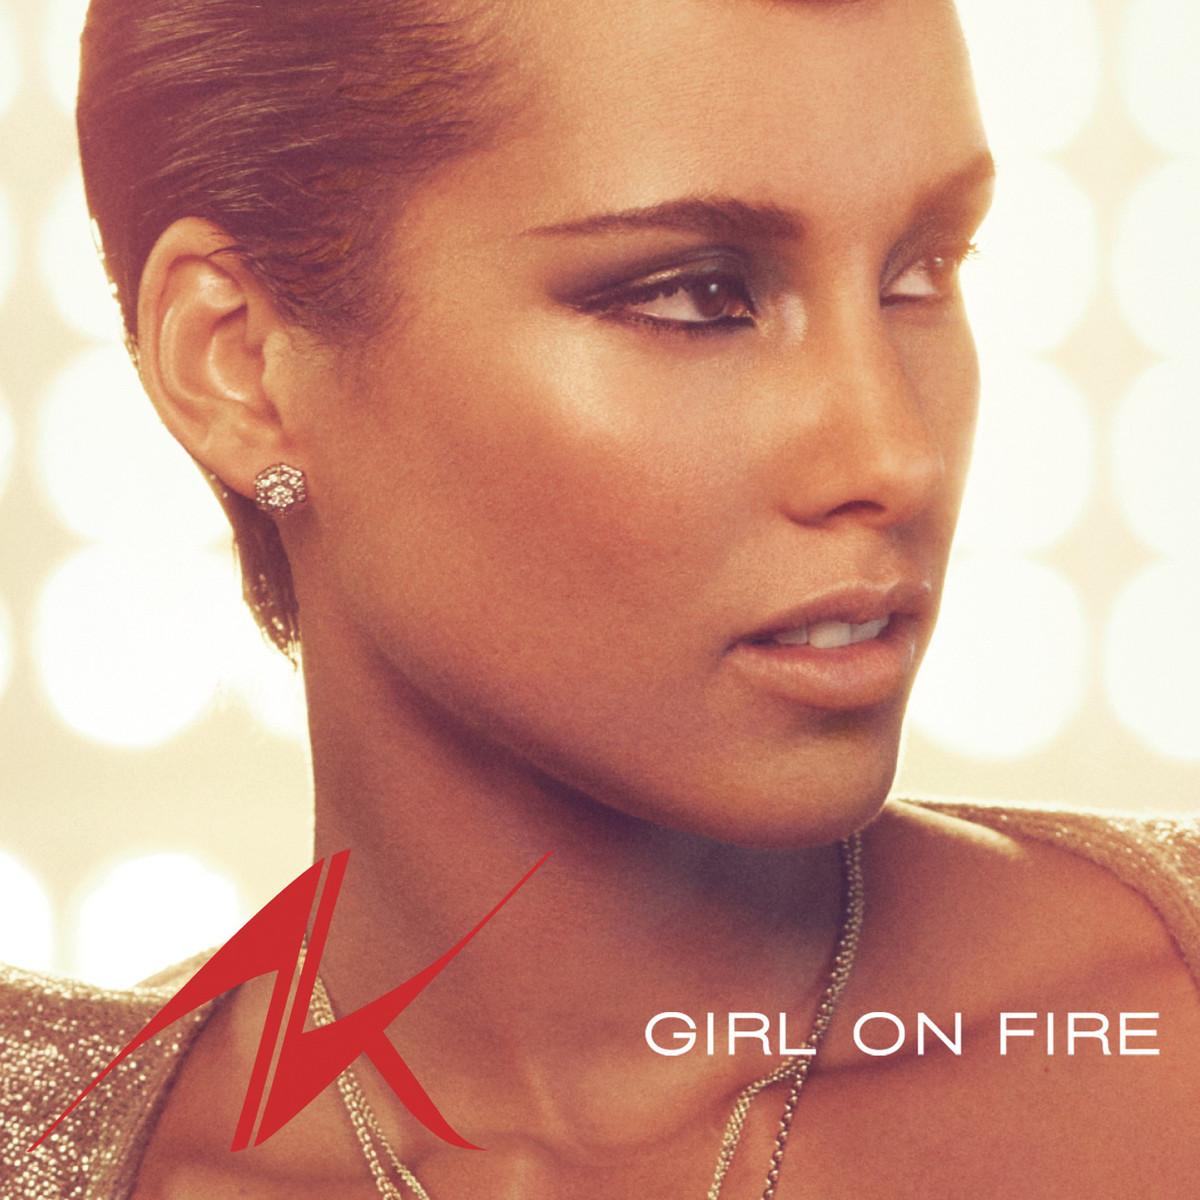 http://3.bp.blogspot.com/-C2RrtMCSw60/UEW50XIExPI/AAAAAAAACZU/dsJCXNSvFV0/s1600/Alicia-Keys-Girl-On-Fire-1200x1200-2012.jpg